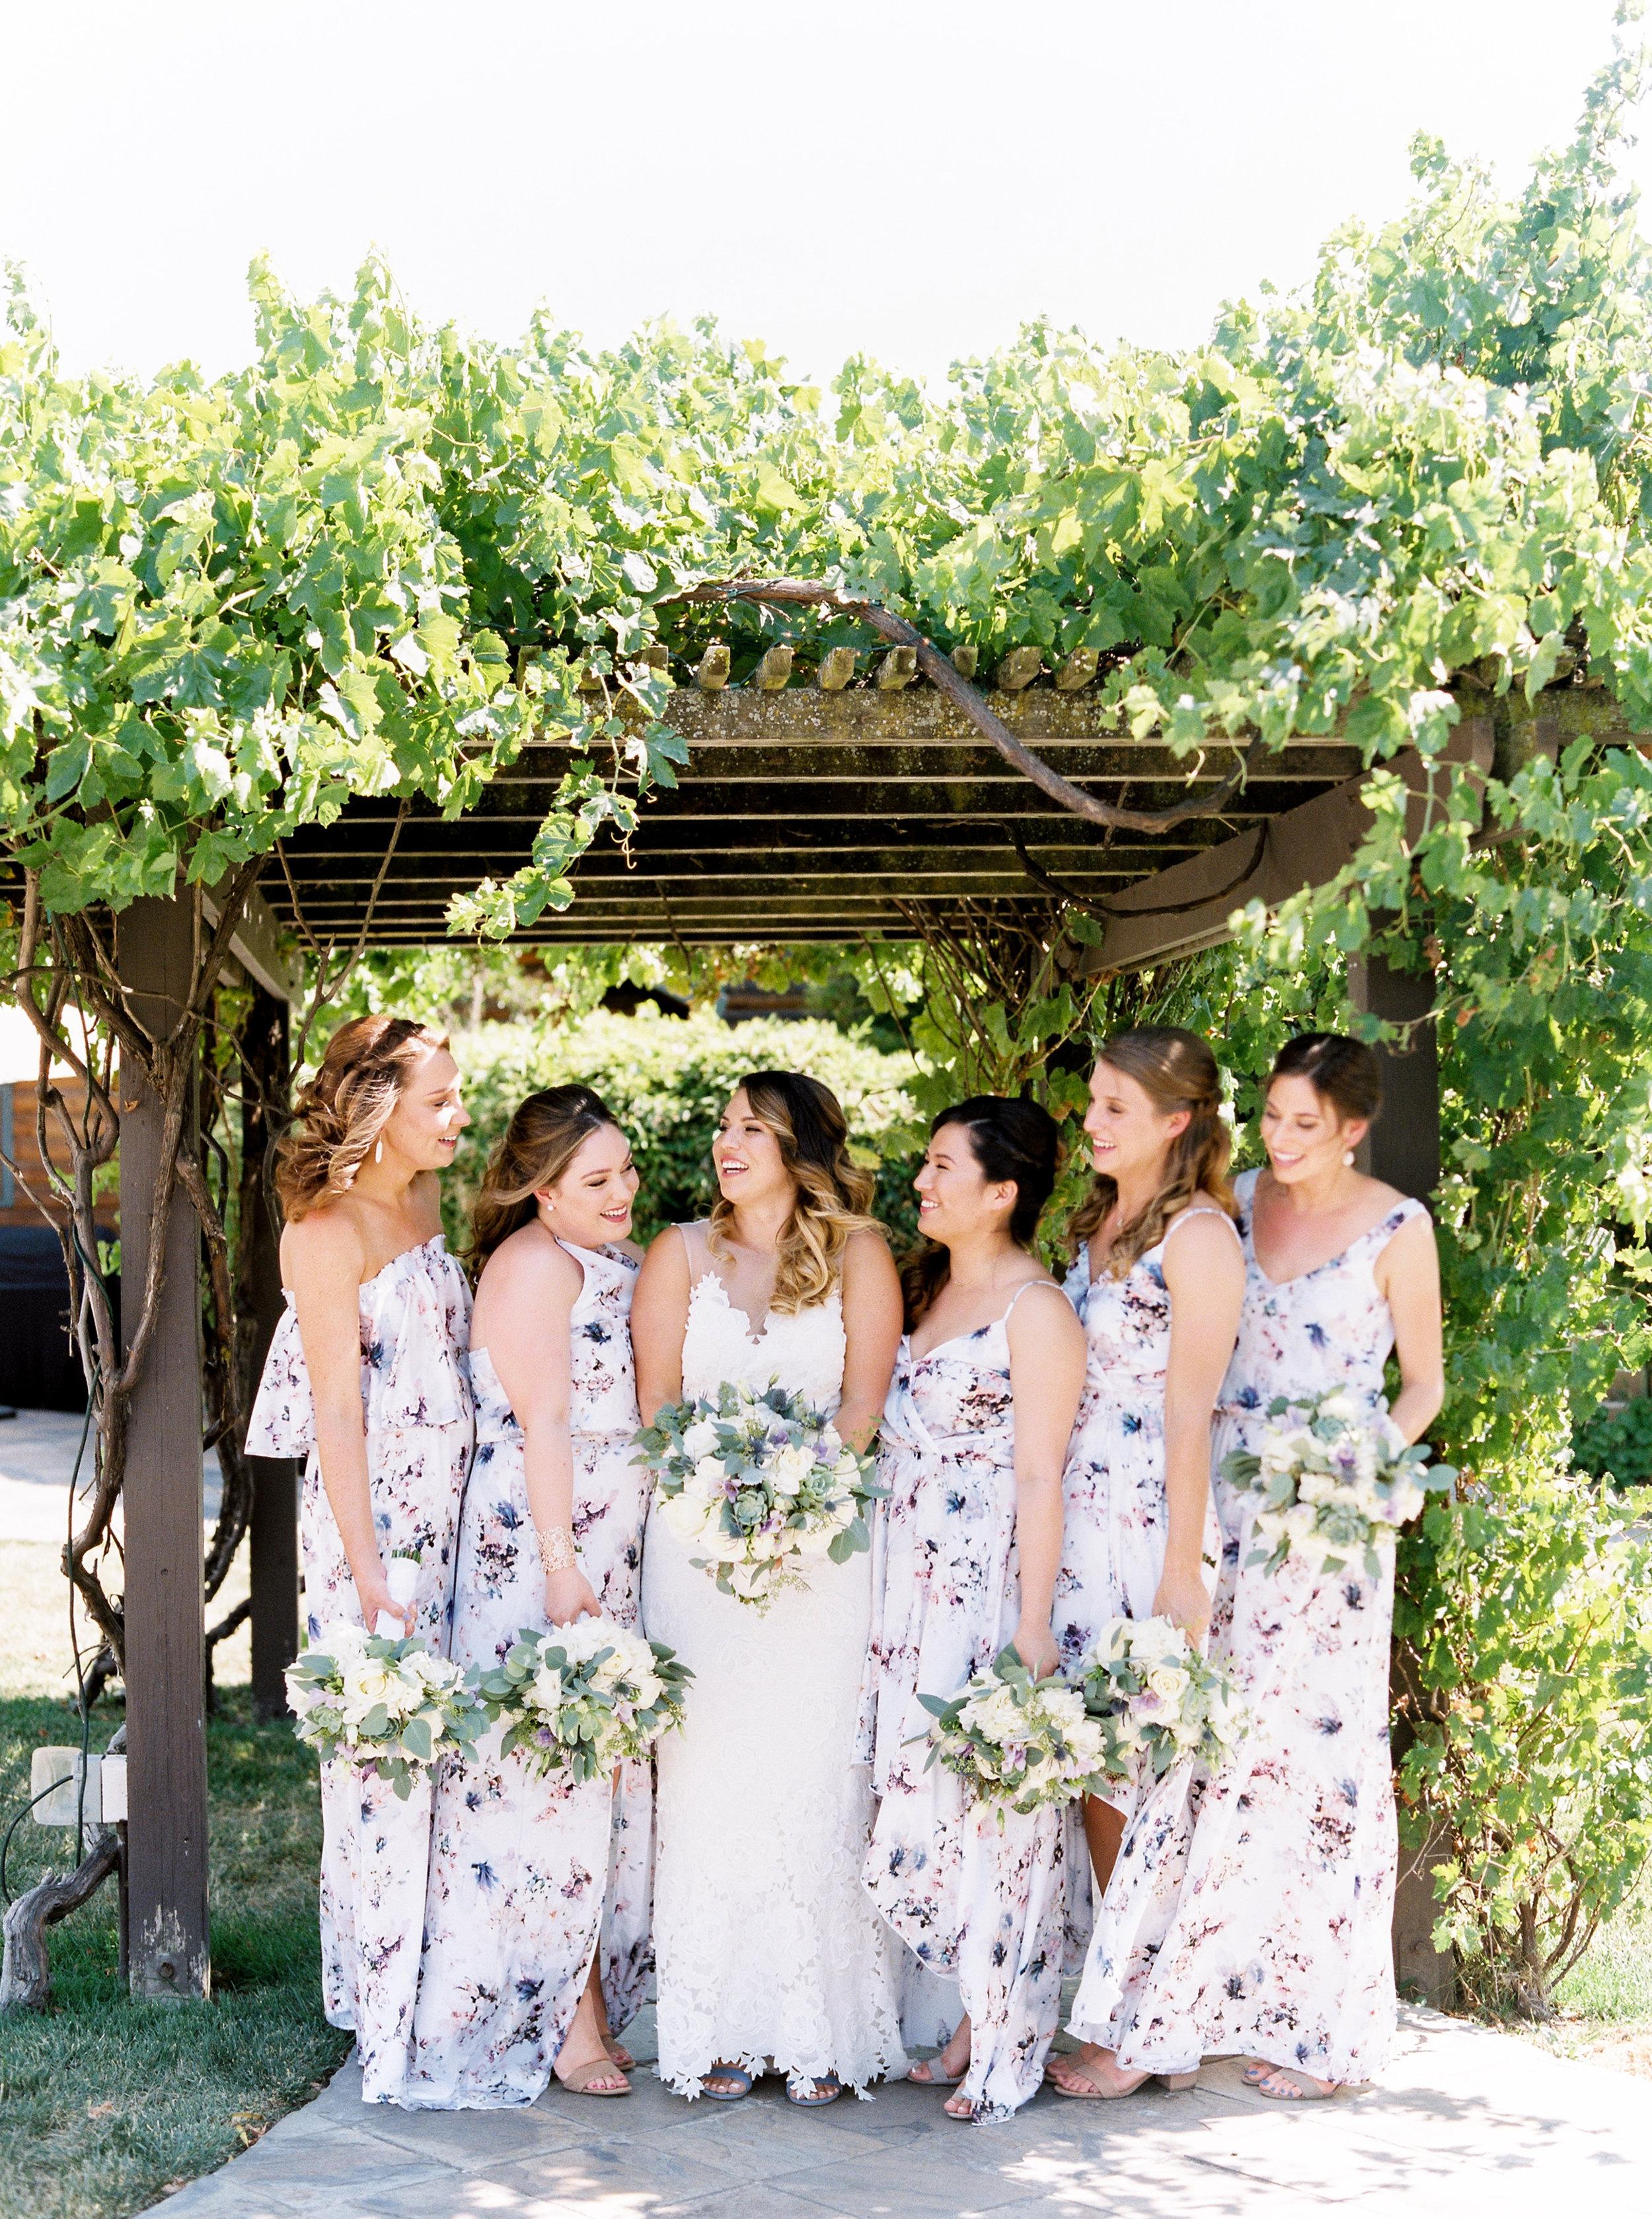 the-purple-orchid-resort-wedding-in-livermore-california-213.jpg